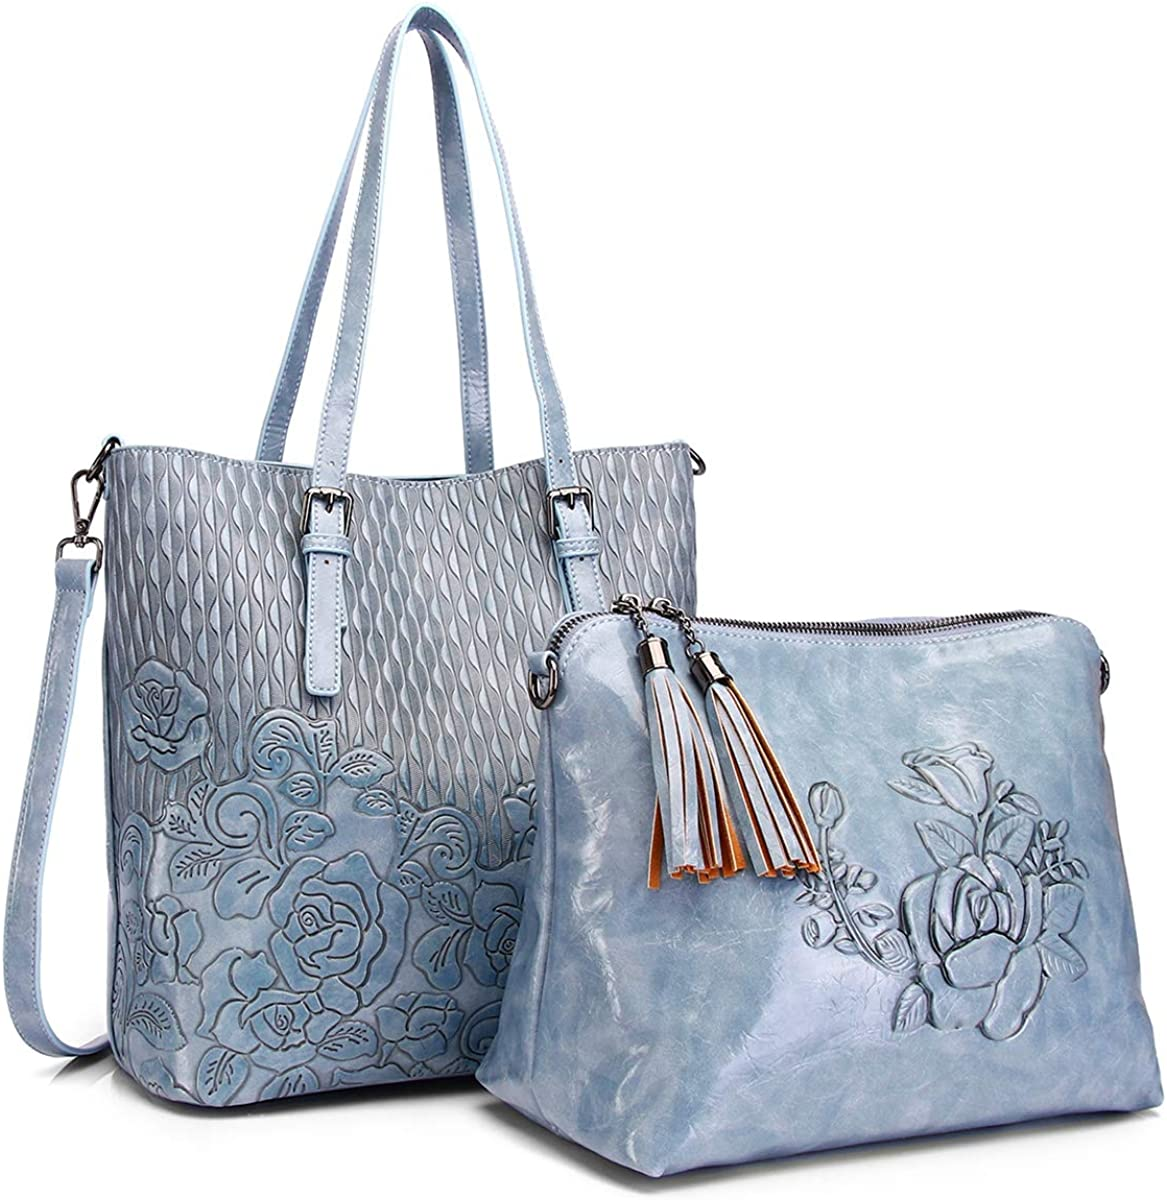 Designer Women Handbag Purse Ladies Totes Embossed Large Capacity Satchels Crossbody Shoulder Bags 95810